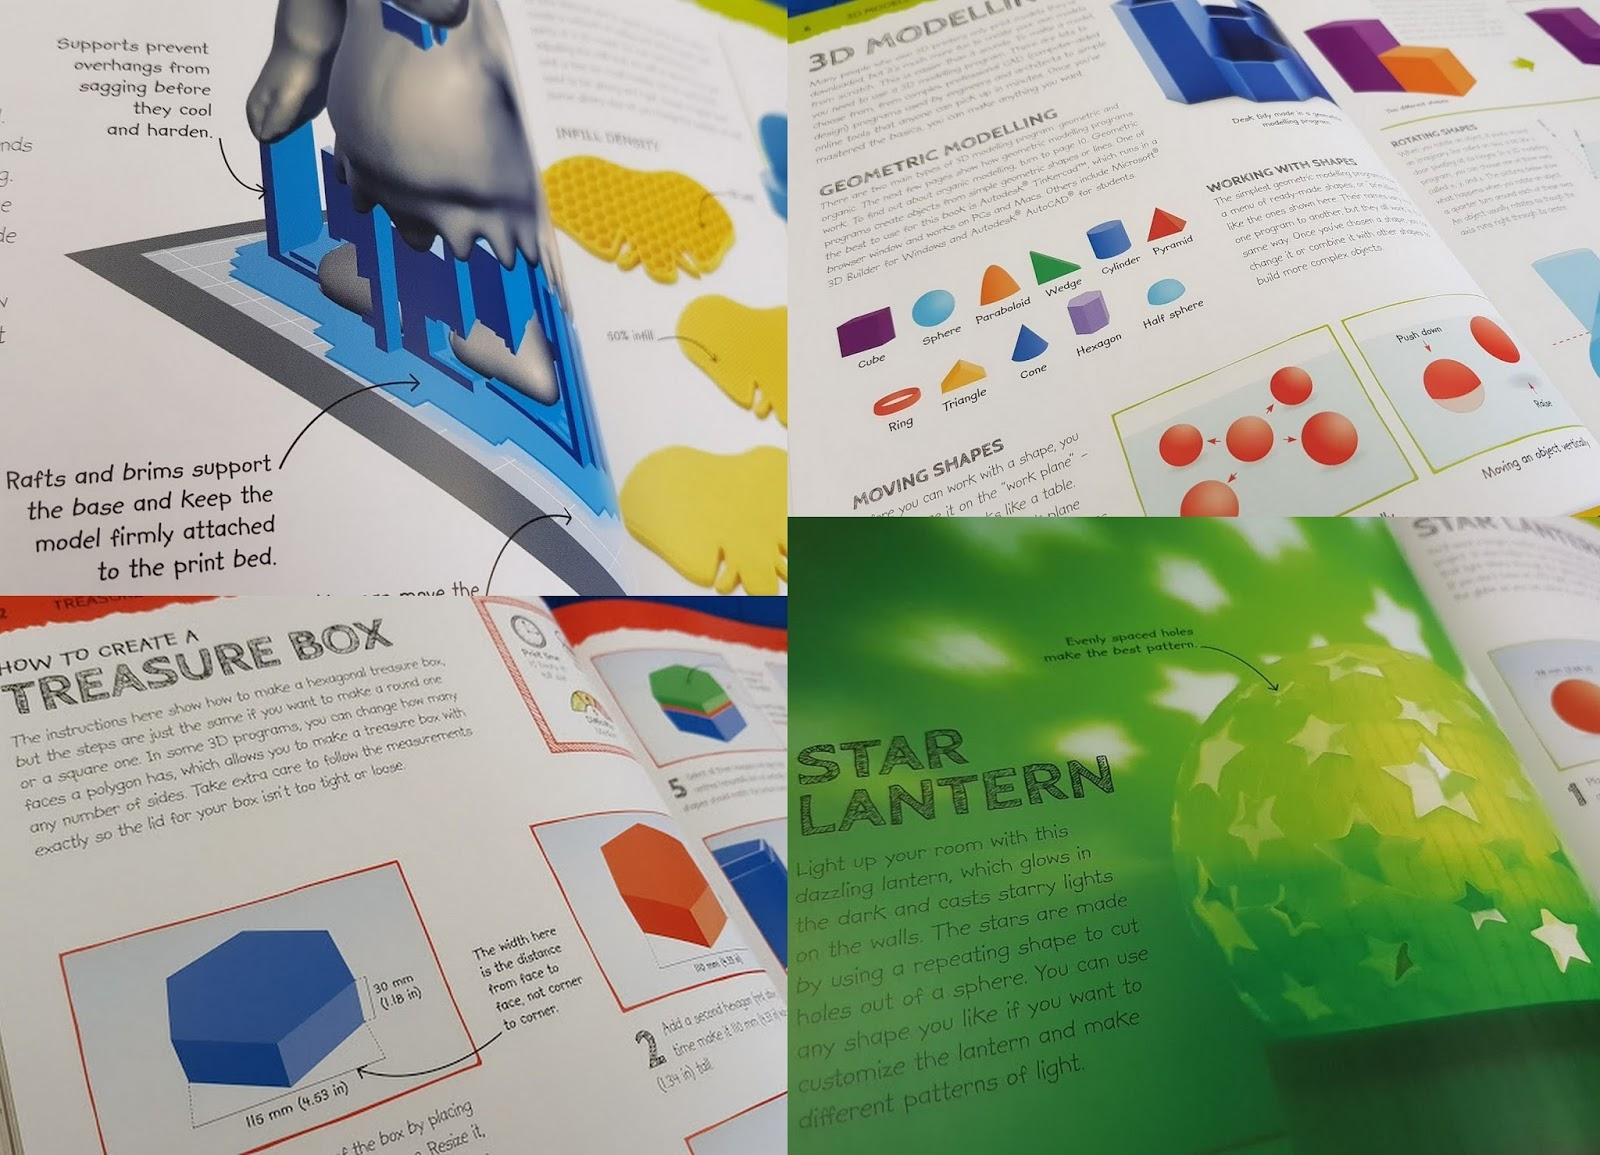 The Brick Castle Dorling Kindersley Technology Fact Books